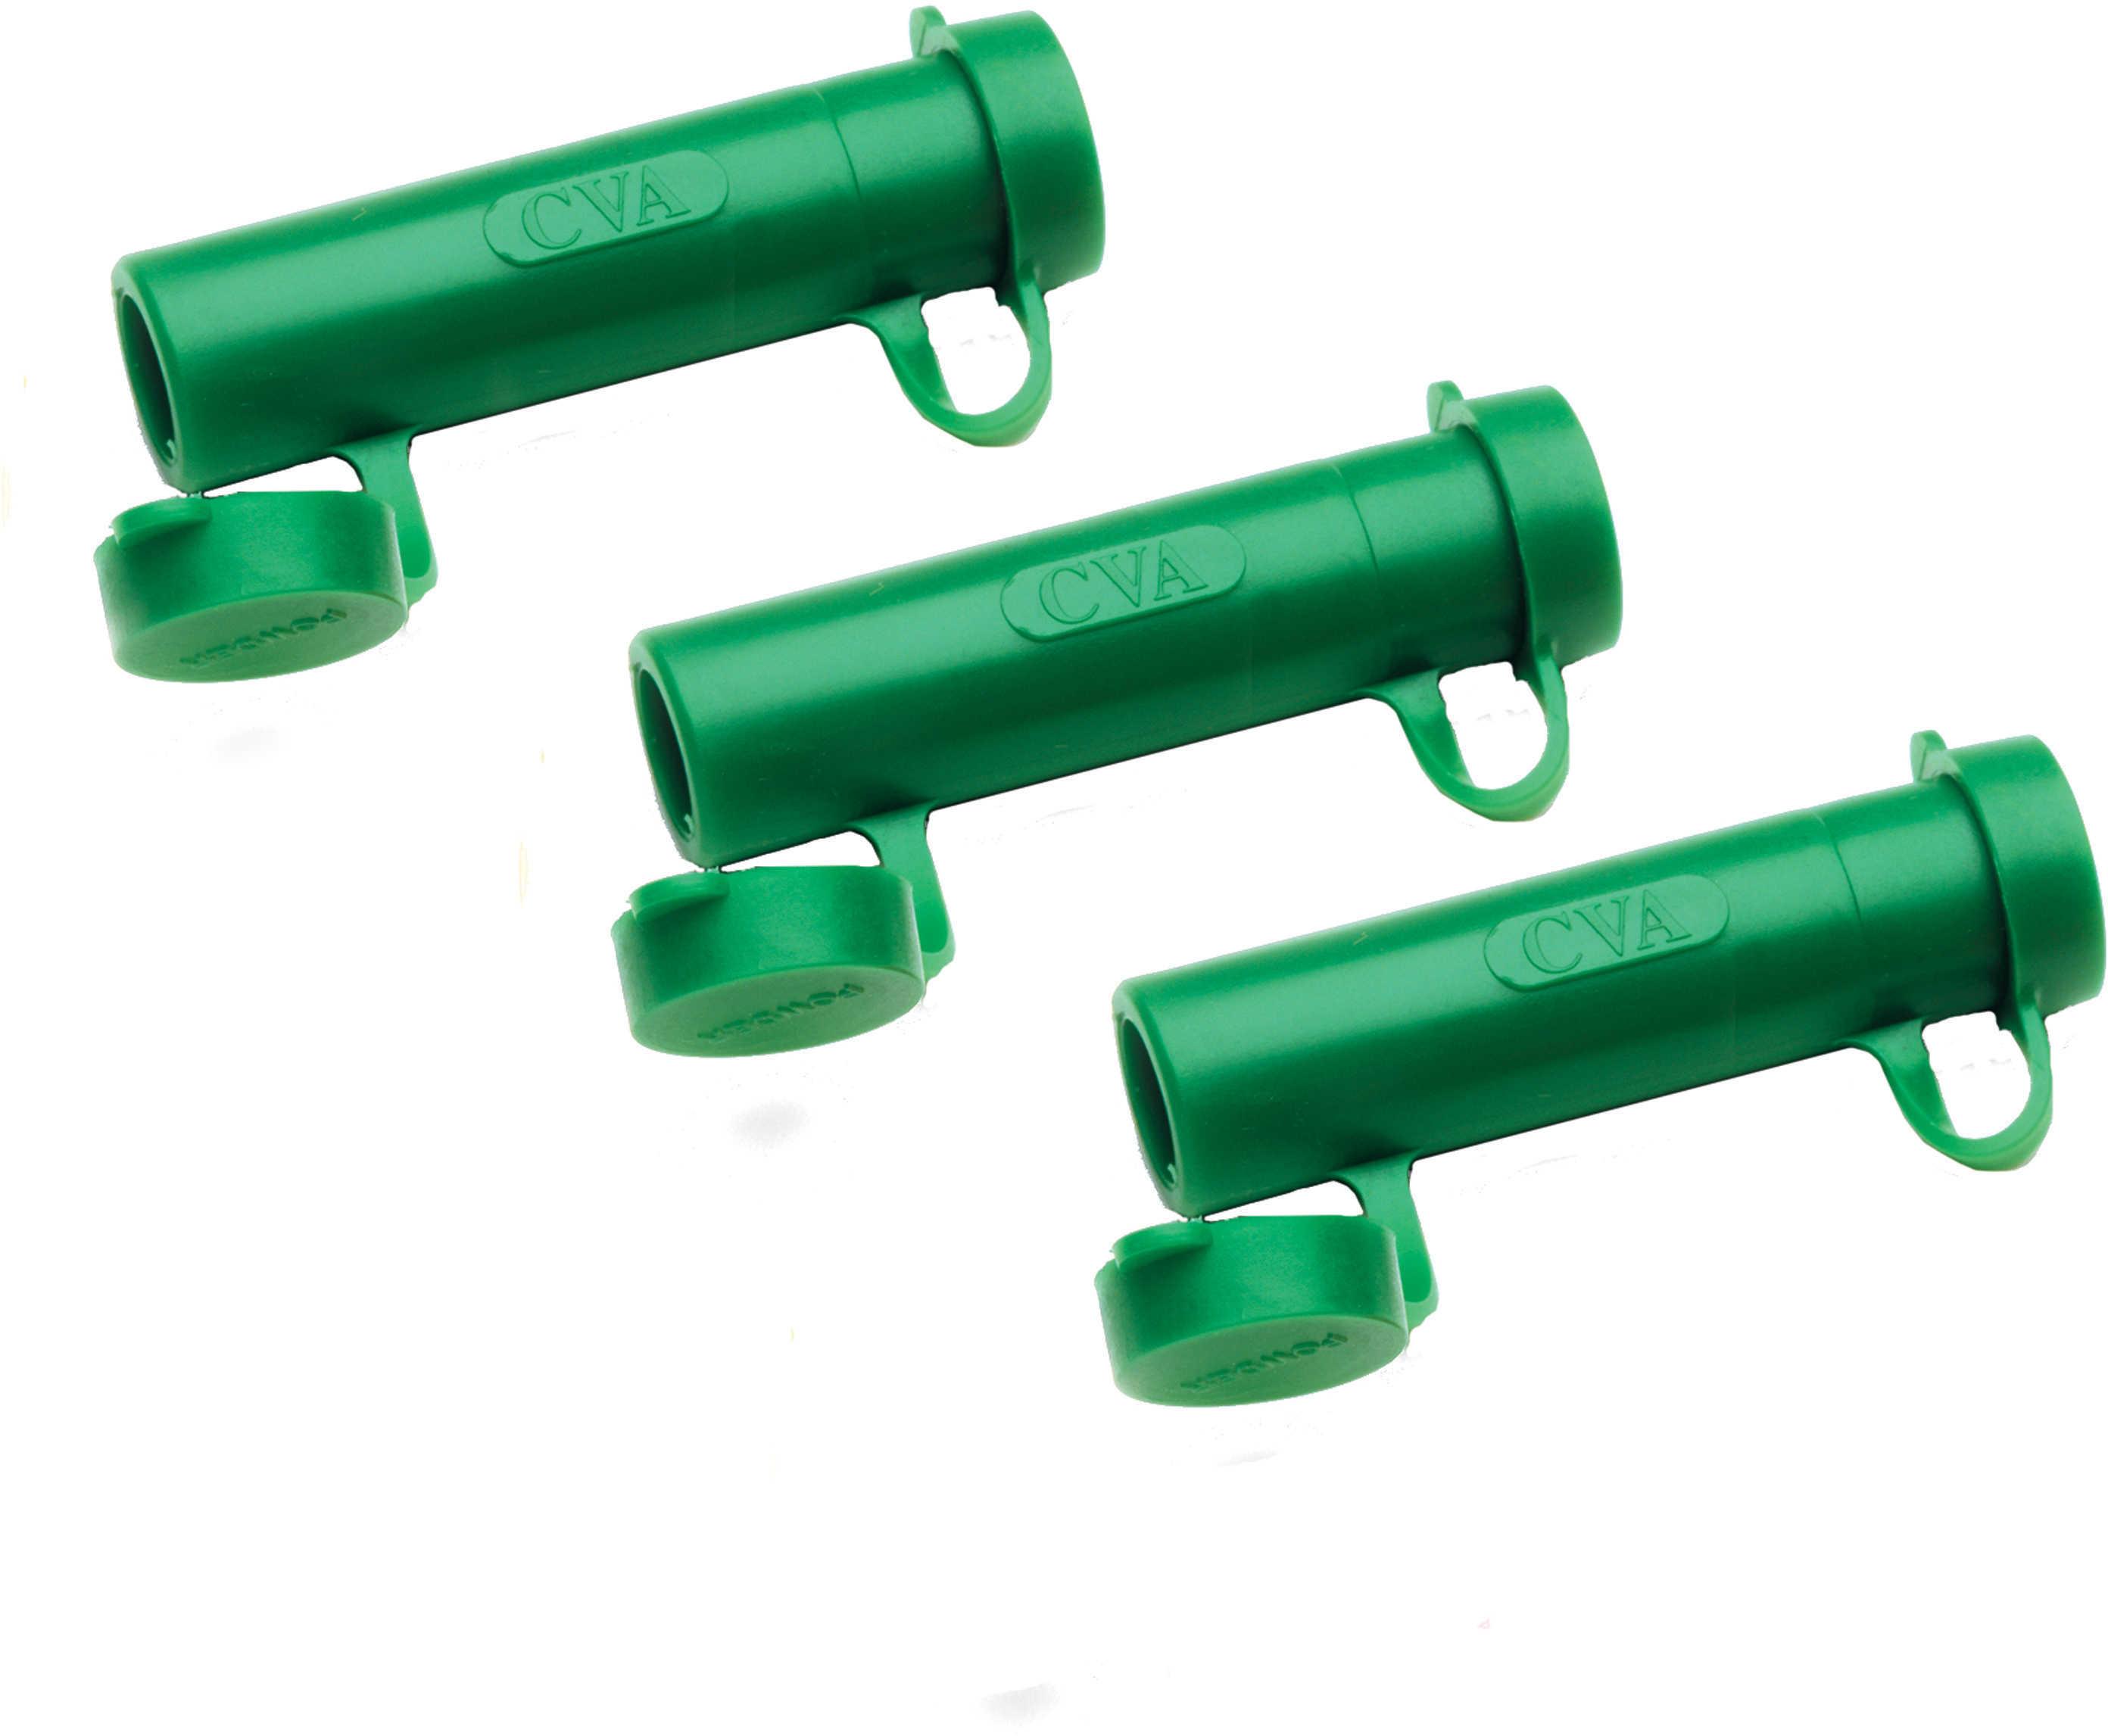 CVA 50 Caliber Rapid Loader 3/Pack Md: AC1556A